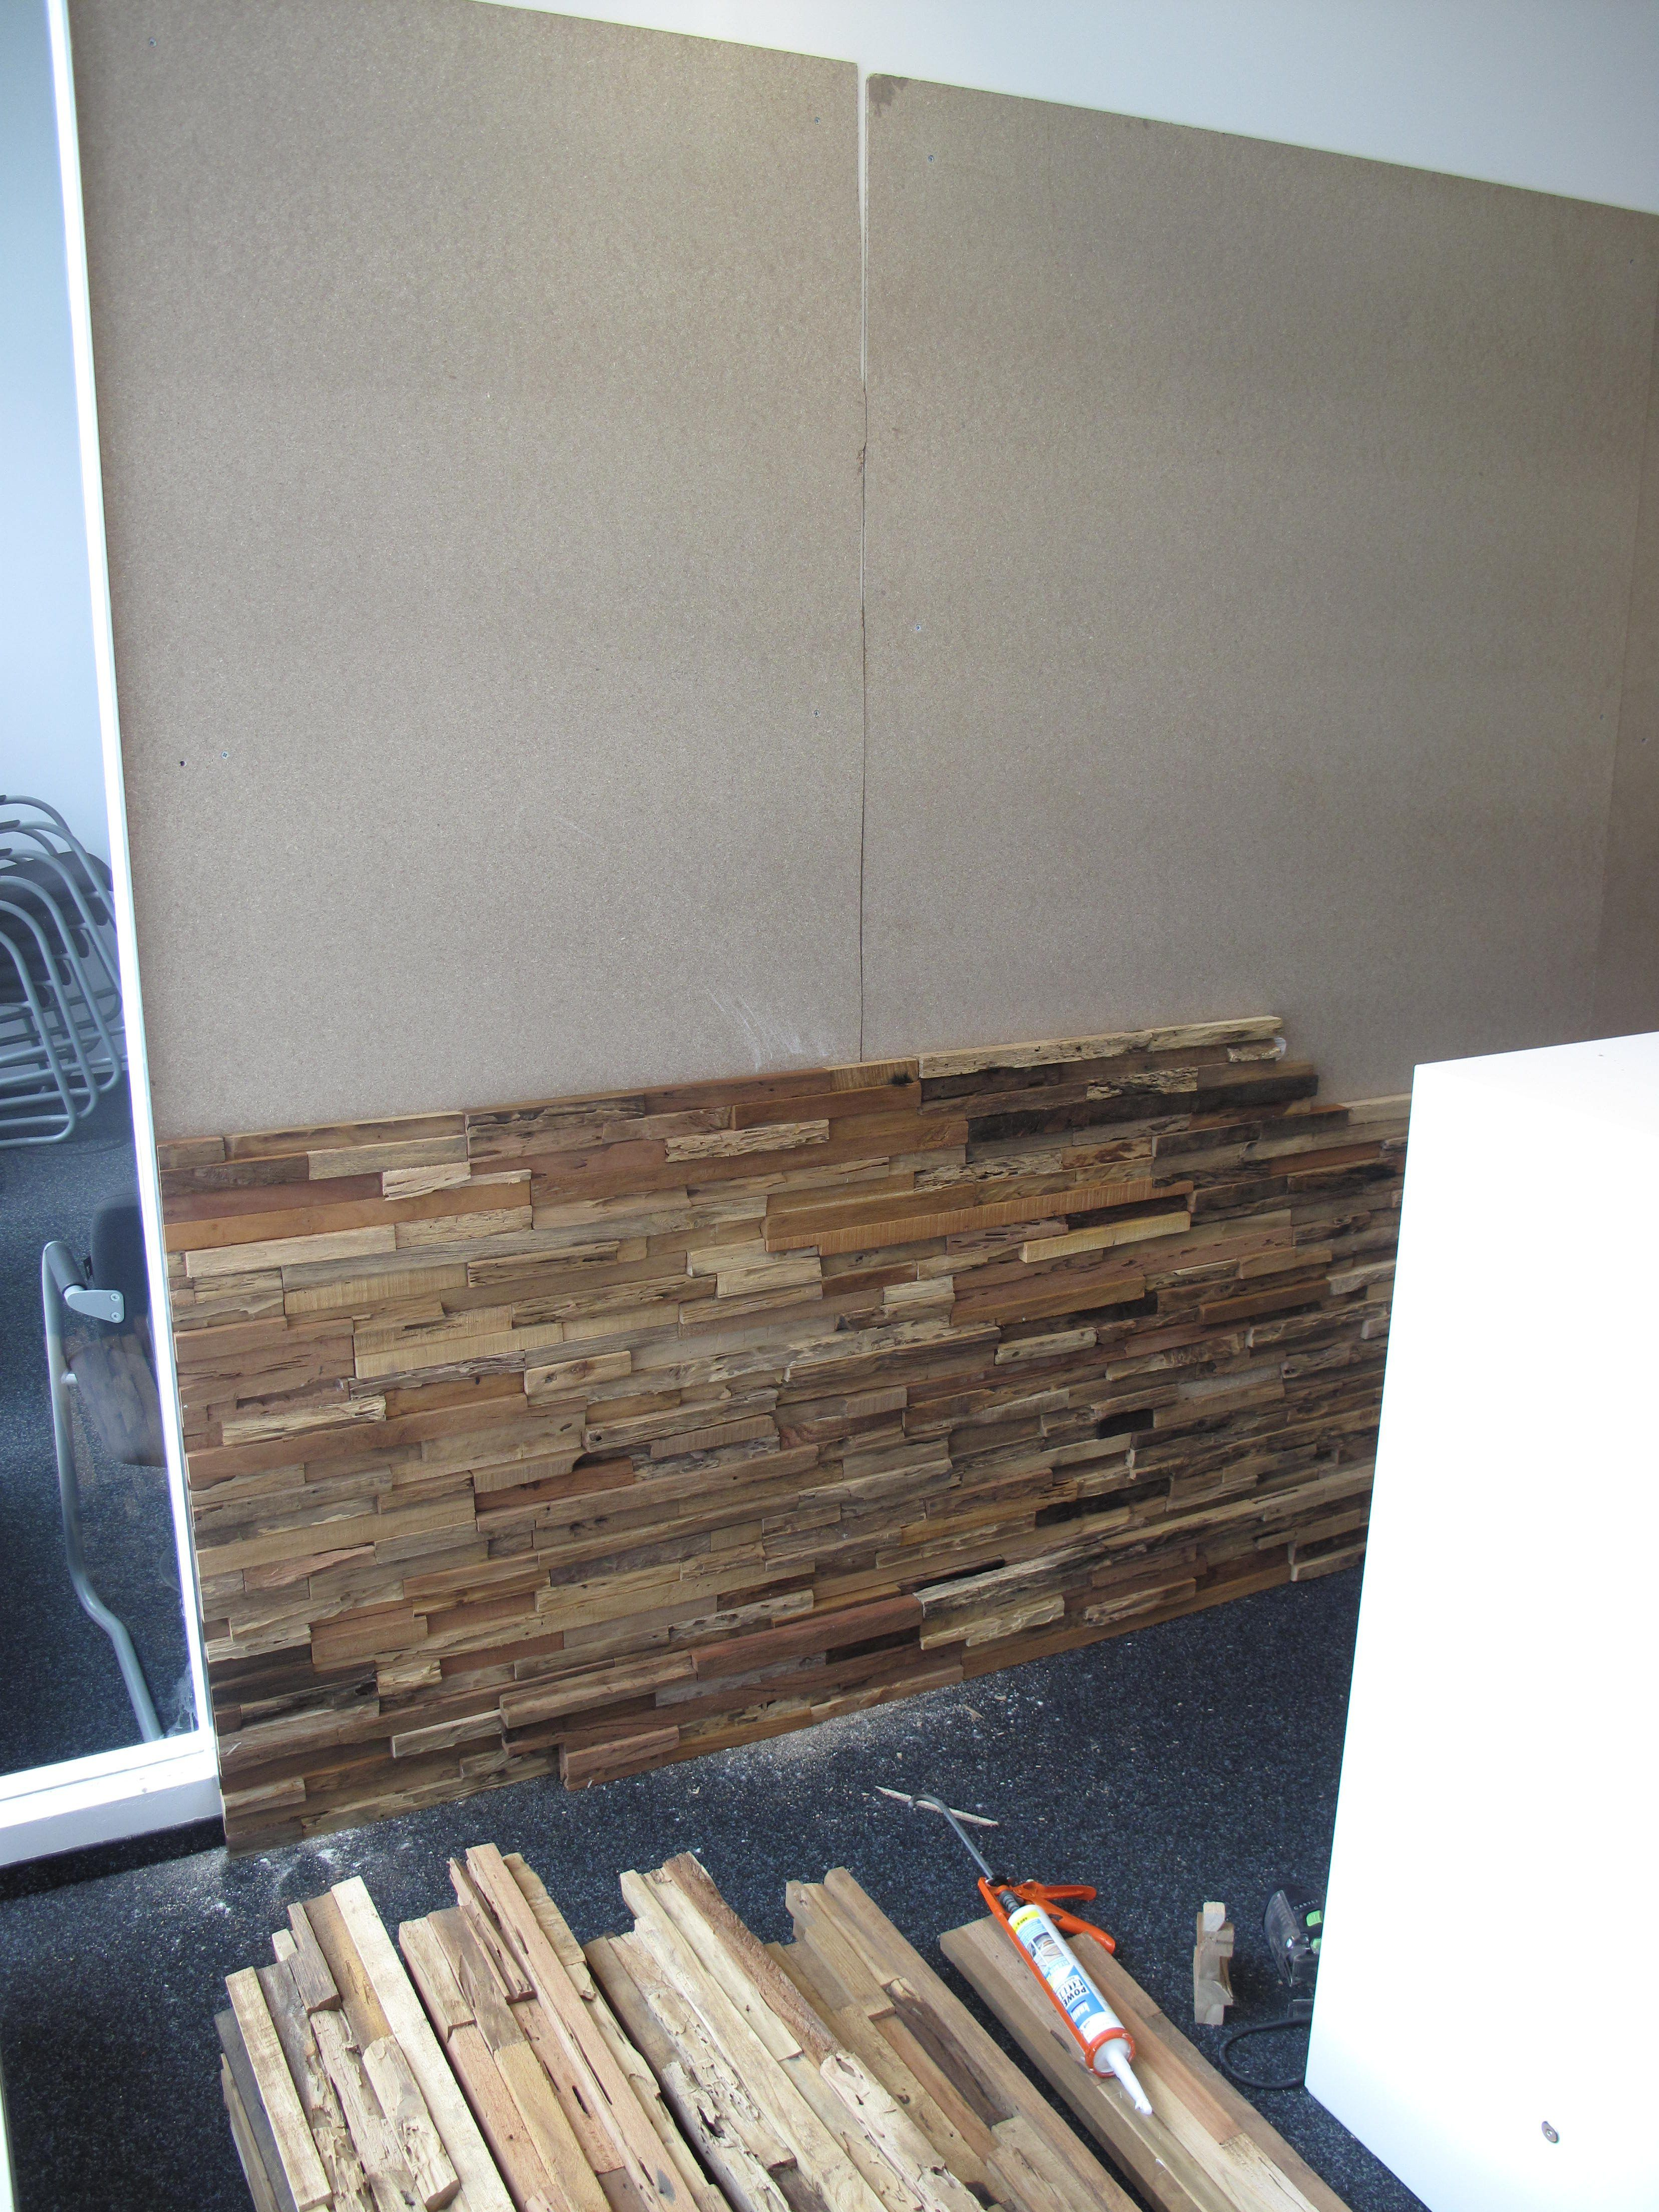 Montage Wandverkleidung Paneele Wandverkleidung Holz Wandpaneele Holz Wandverkleidung